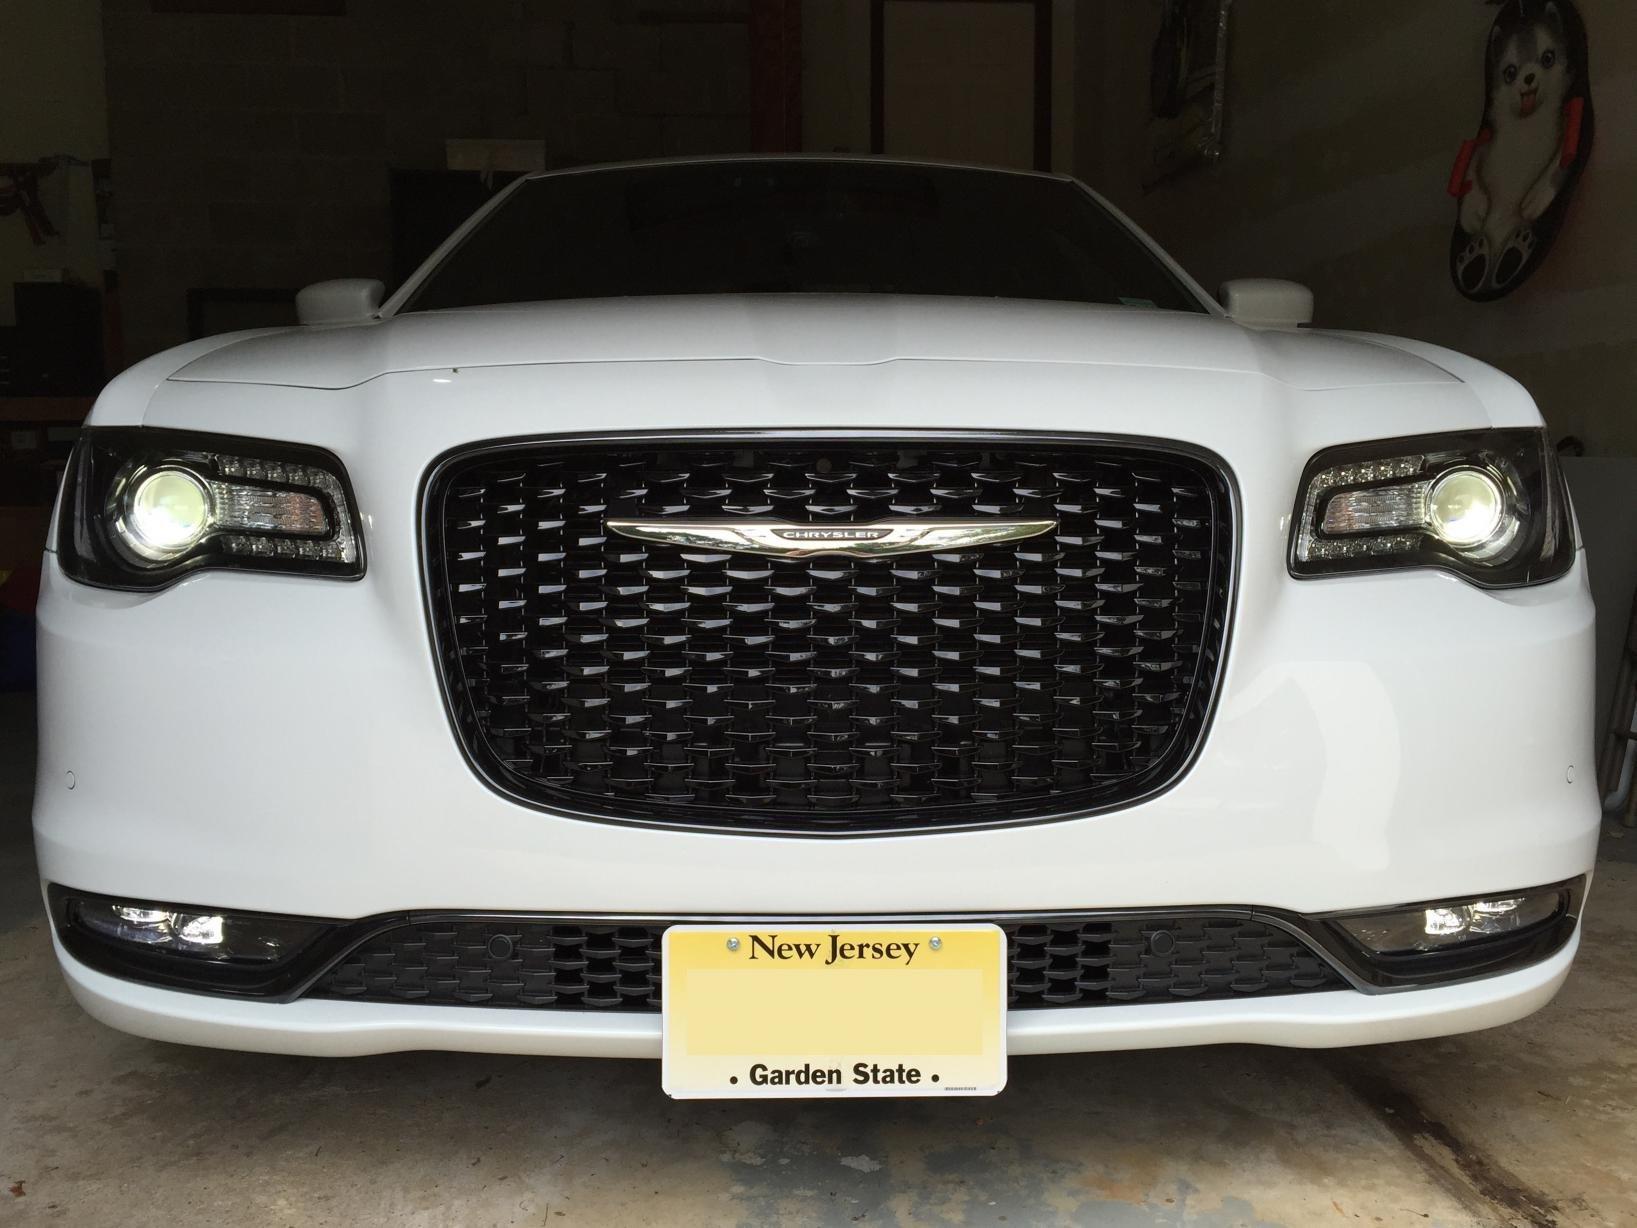 Removable, Metal Sto N Sho License Plate Bracket for 2011-2014 Chrysler 300